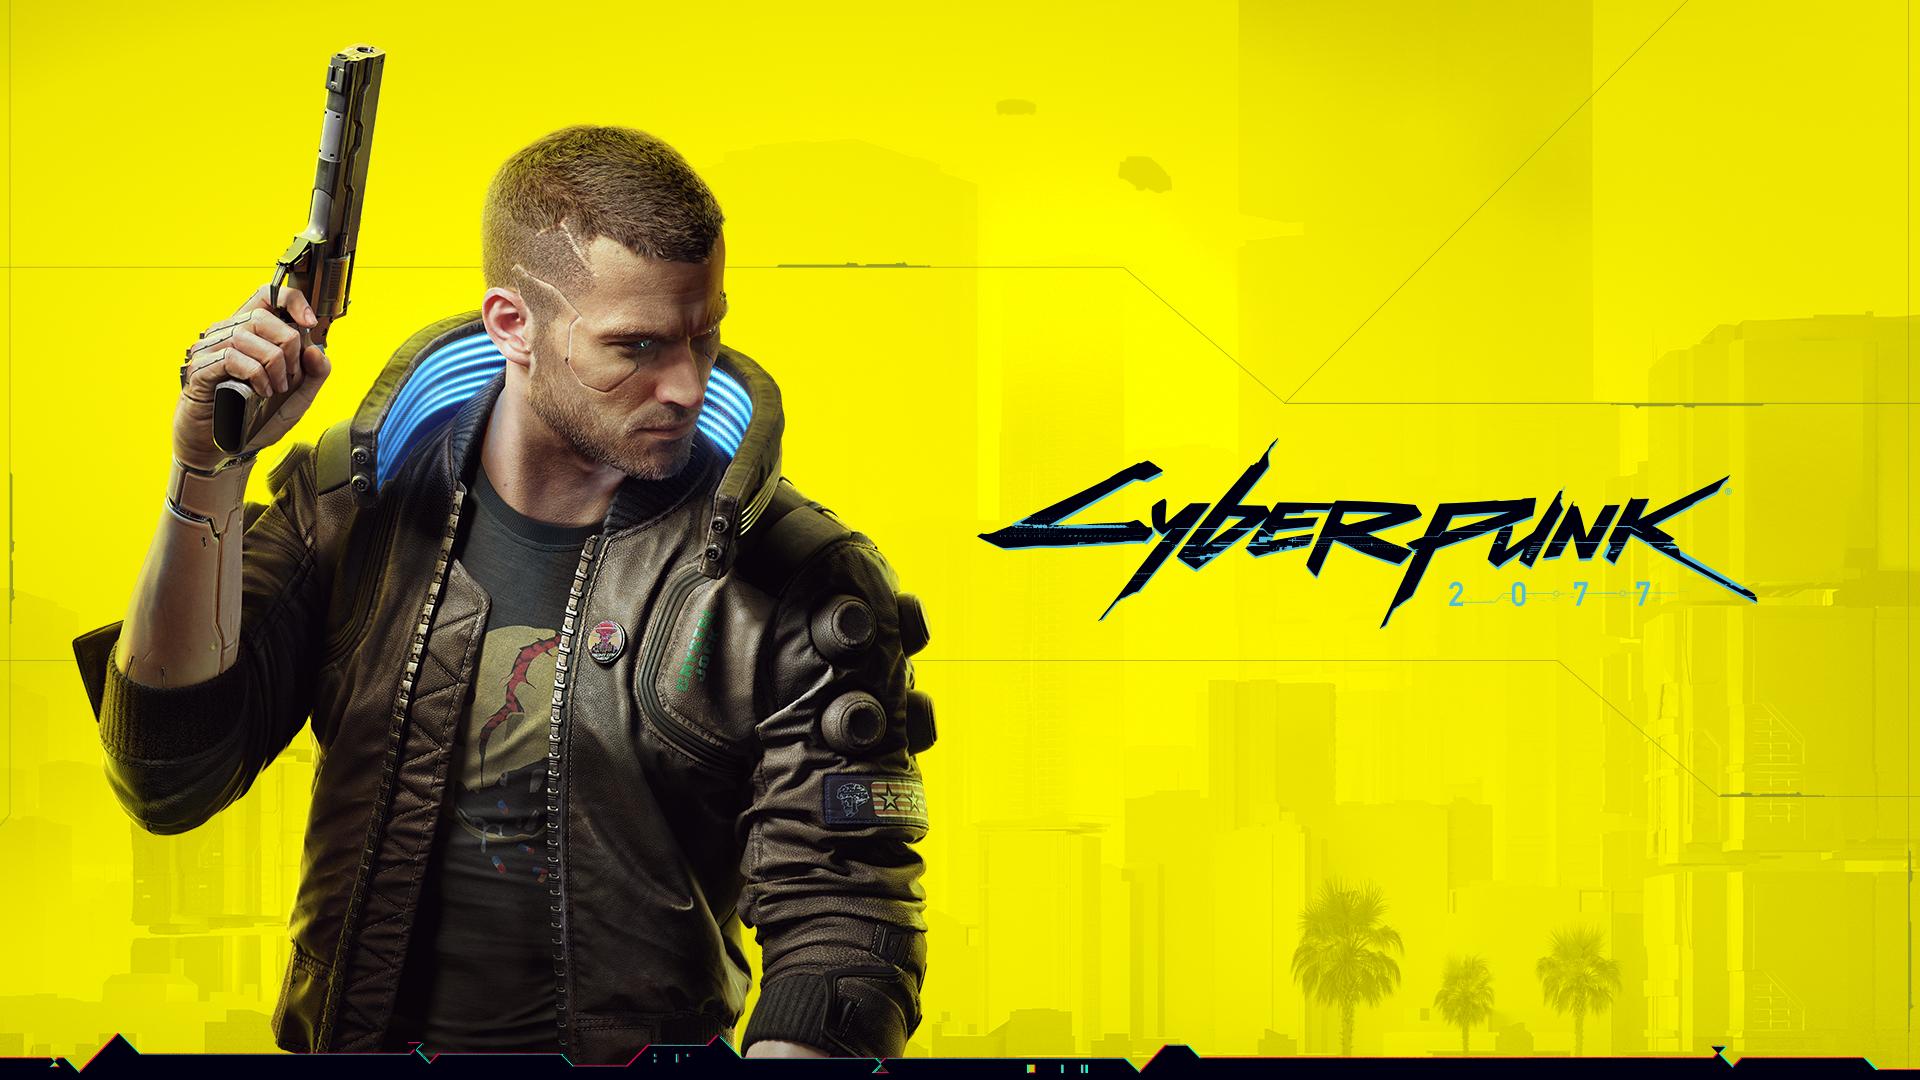 Cyberpunk 2077 発売初日でTwitchの同時視聴者数が100万人突破!